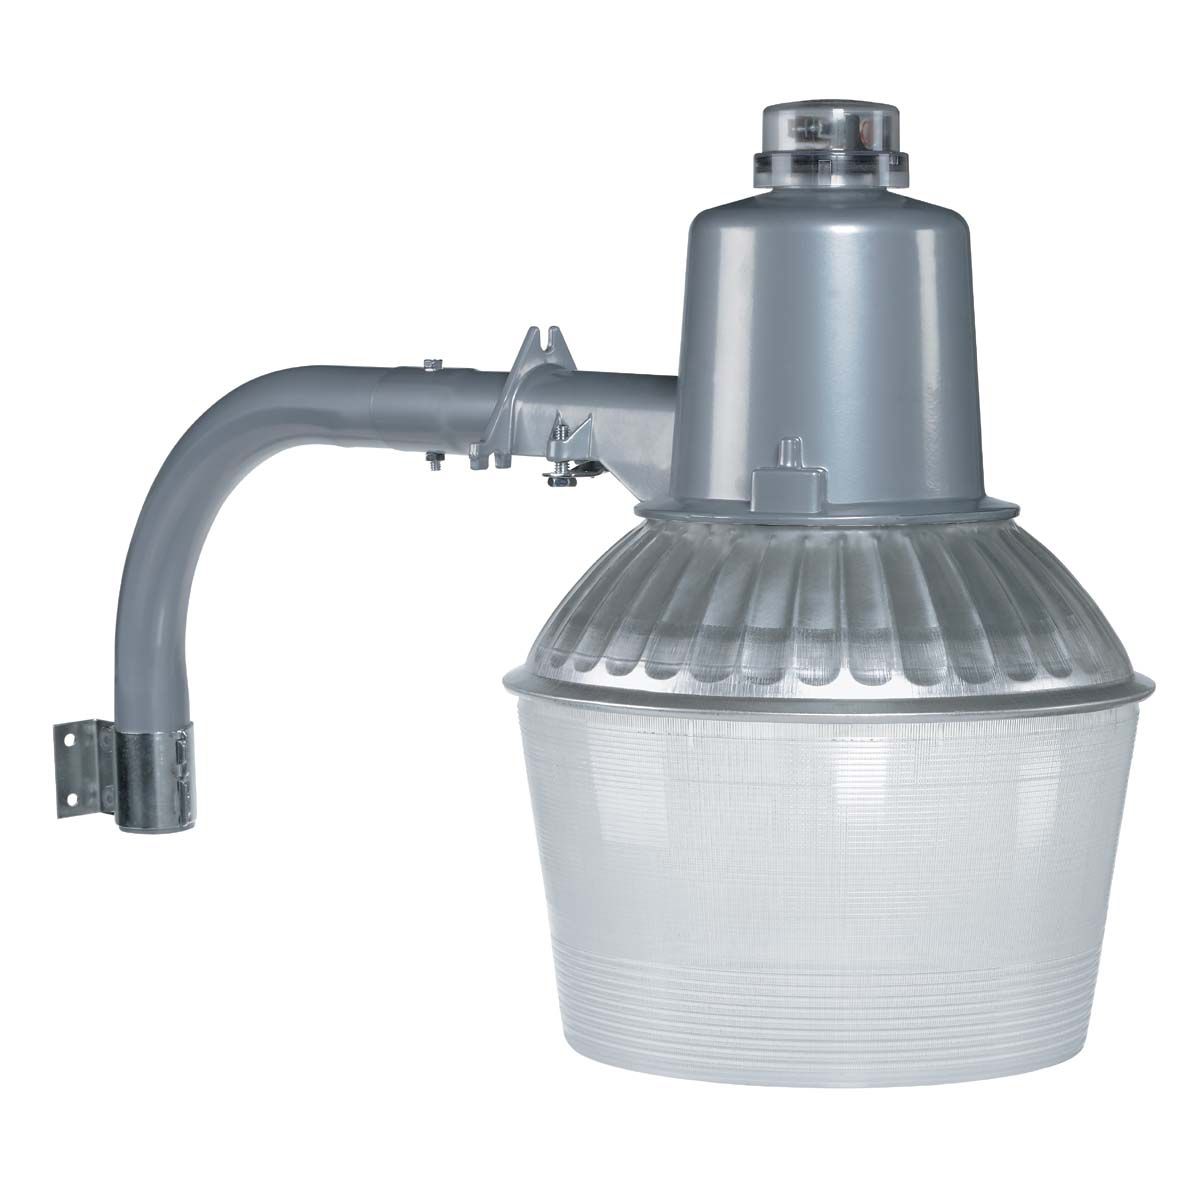 Dusk to dawn outdoor lighting globe electric 150 watt 150w dusk to dawn sodium bulb outdoor security flood light aloadofball Images